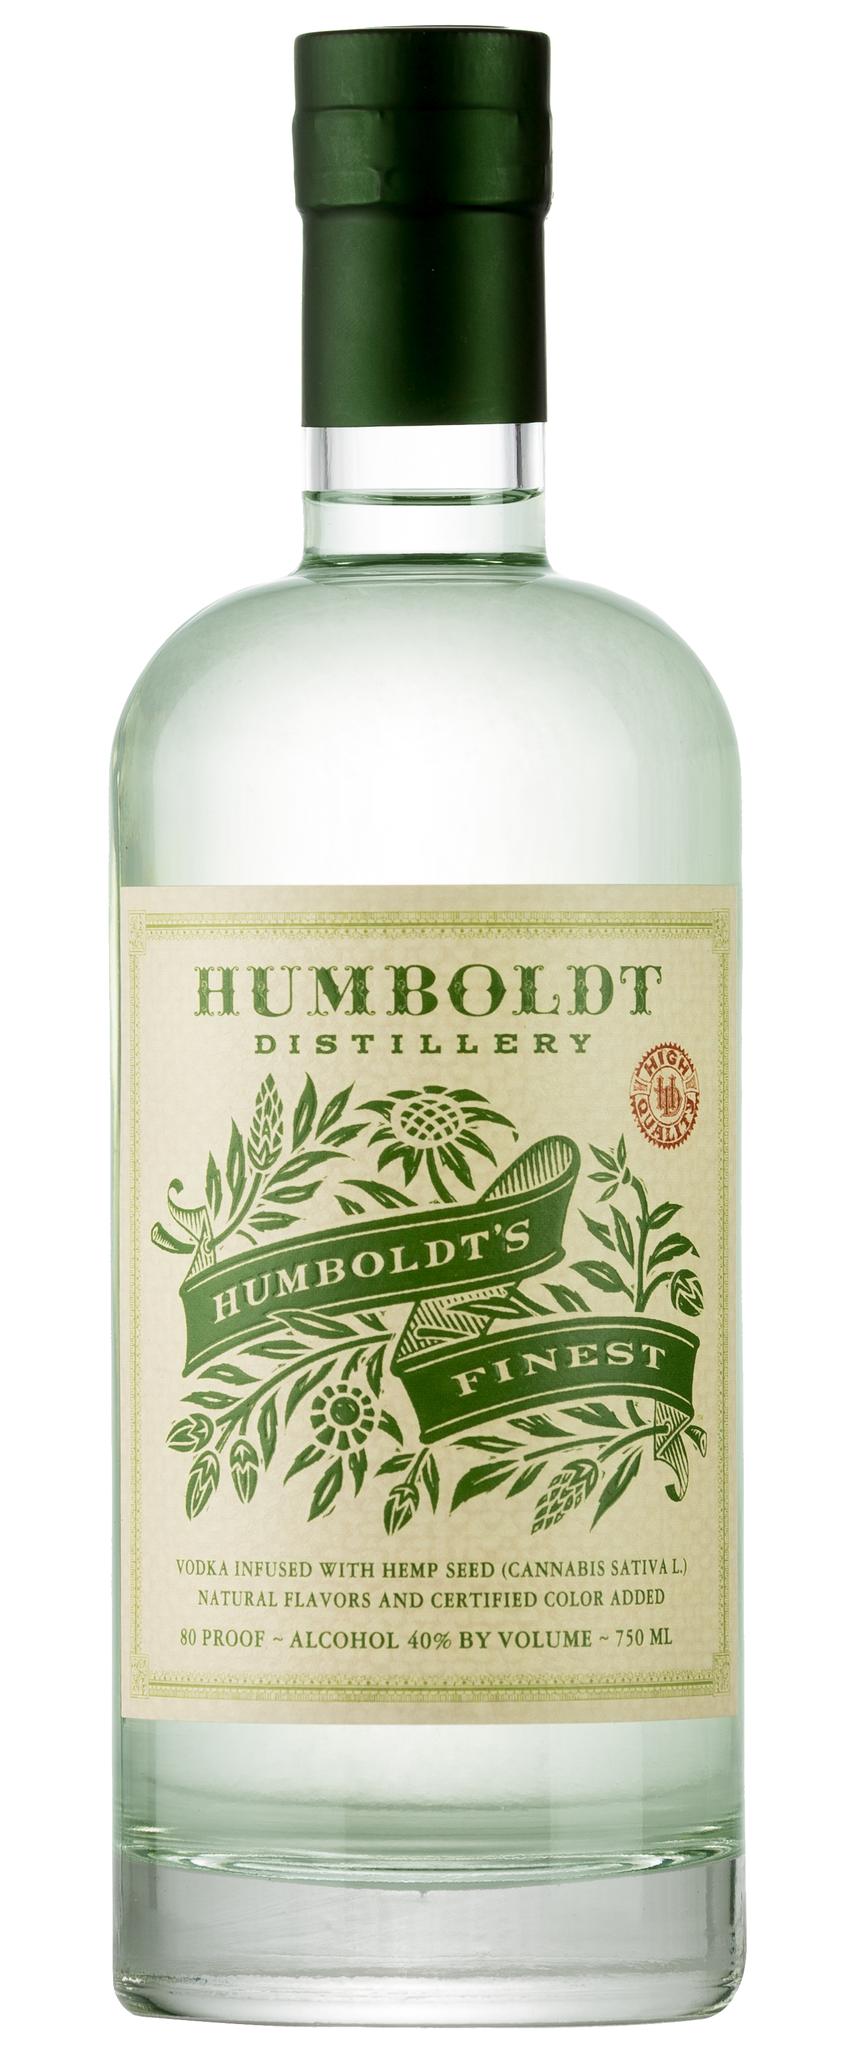 Humboldt Distillery